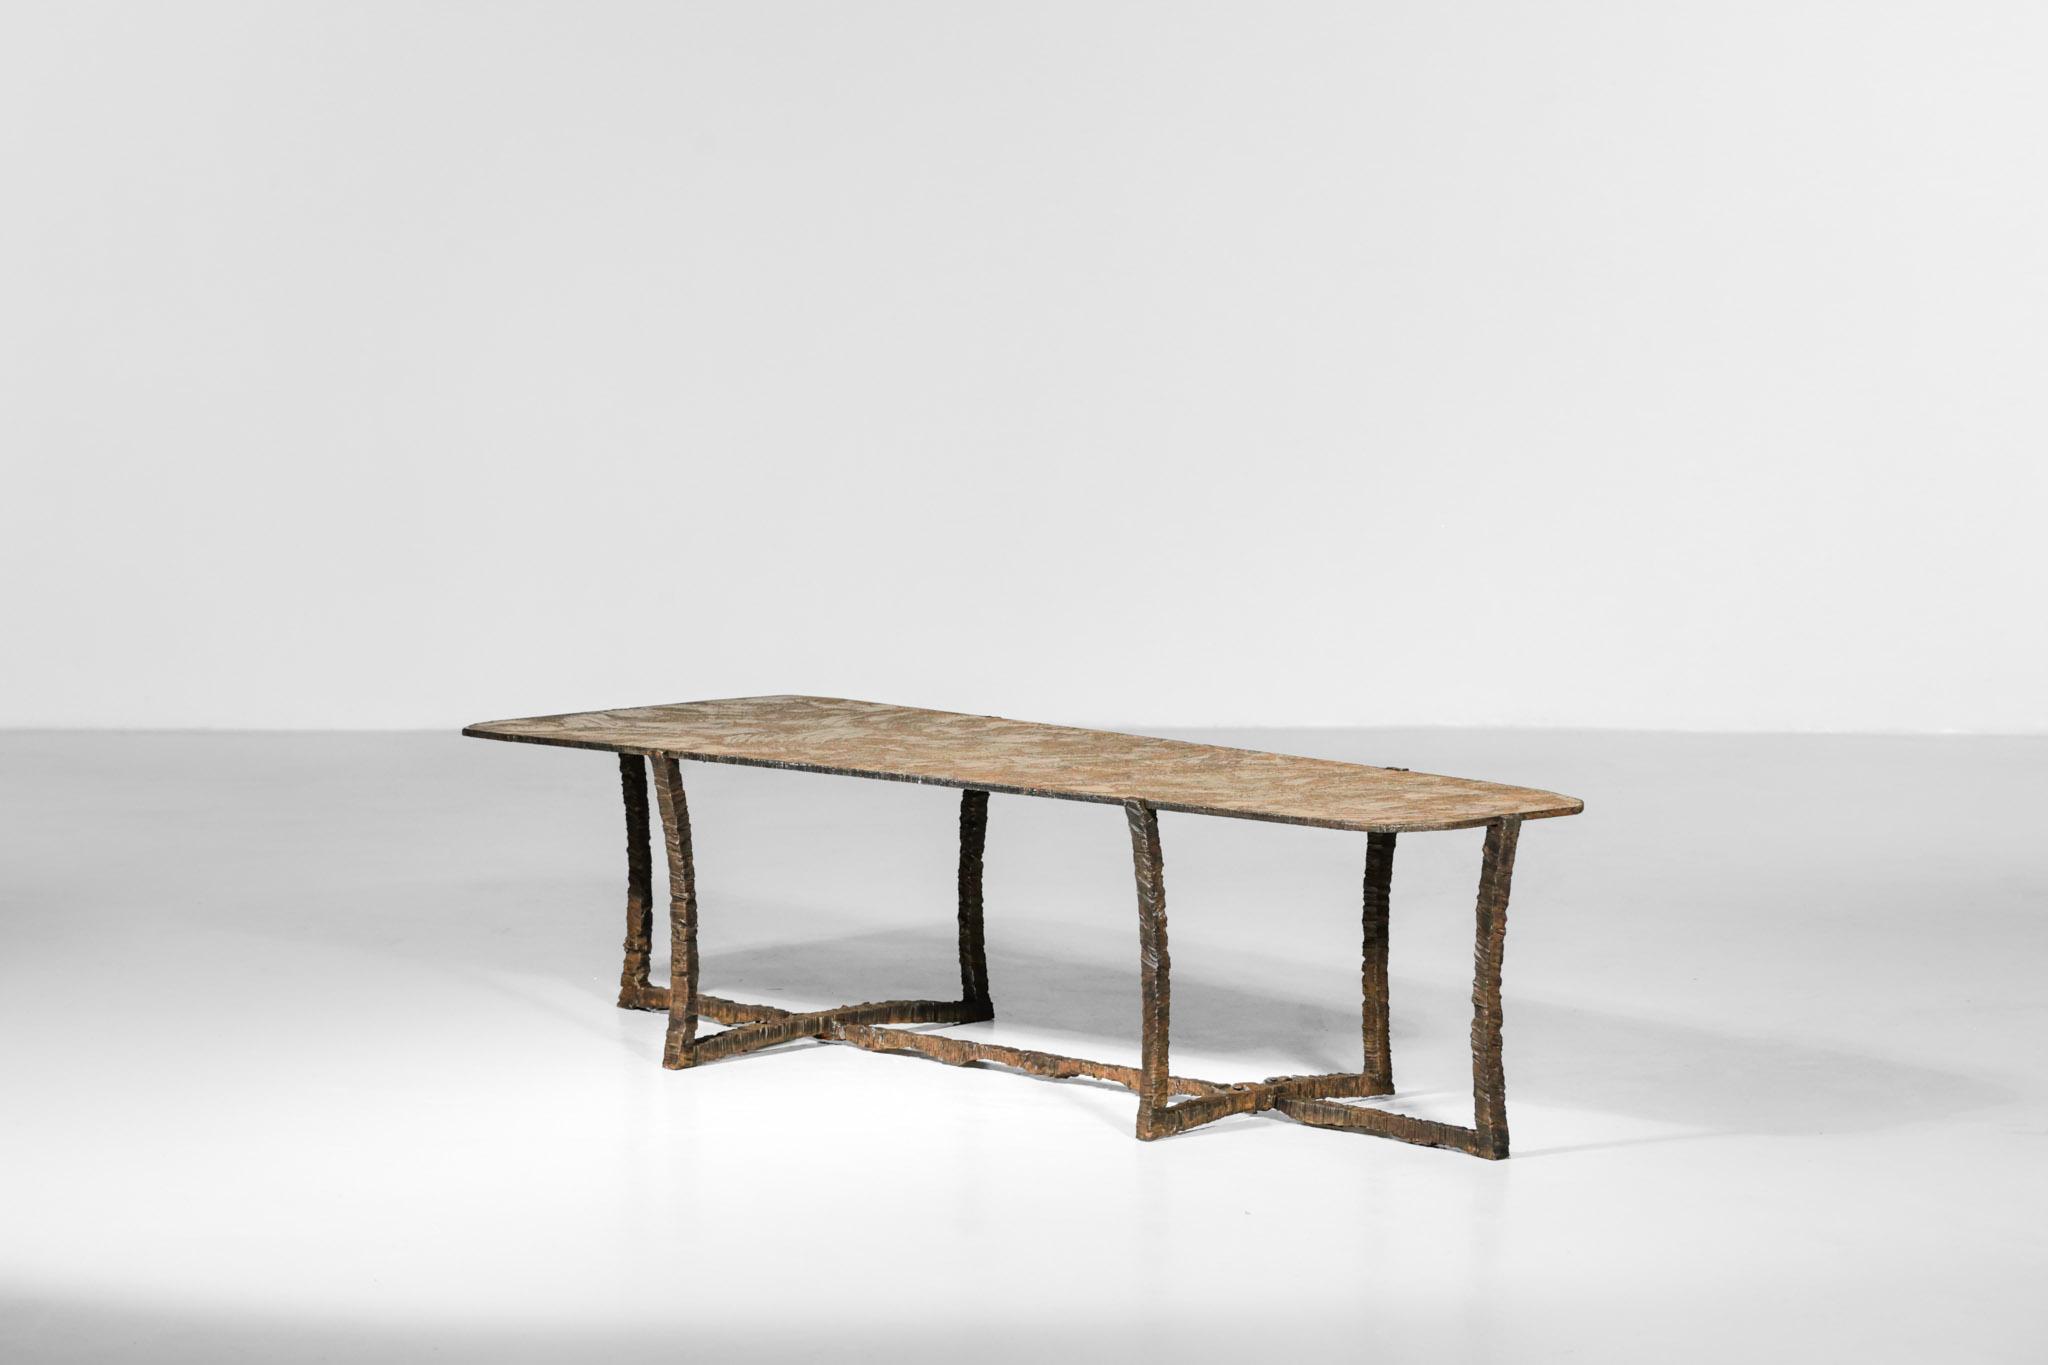 Studio Danke Galerie table basse creation Bryan parlletti fer forgé bronze19